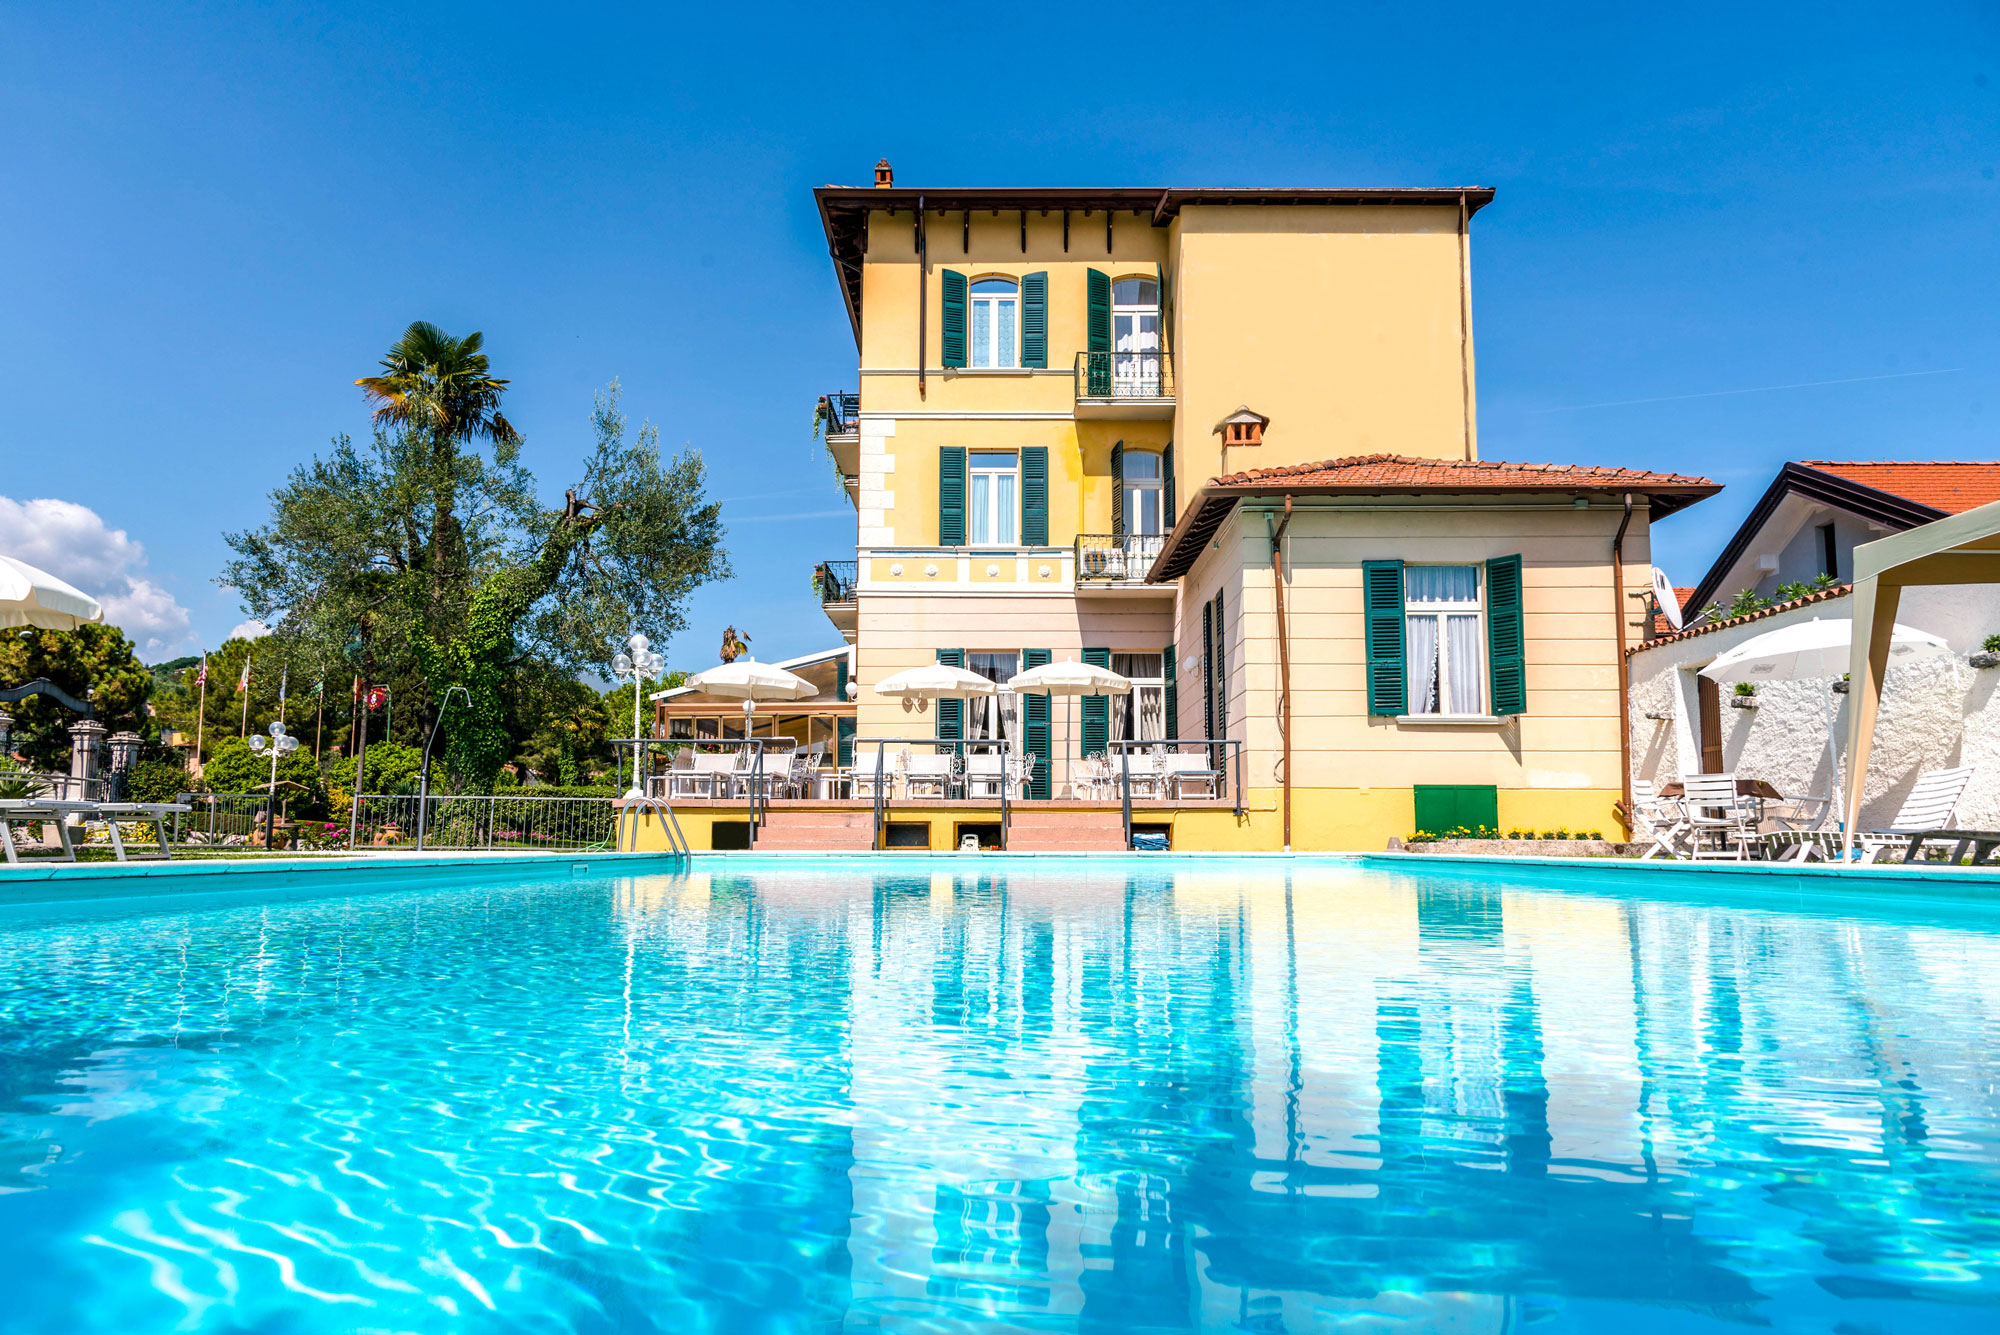 piscina hotel maderno 2